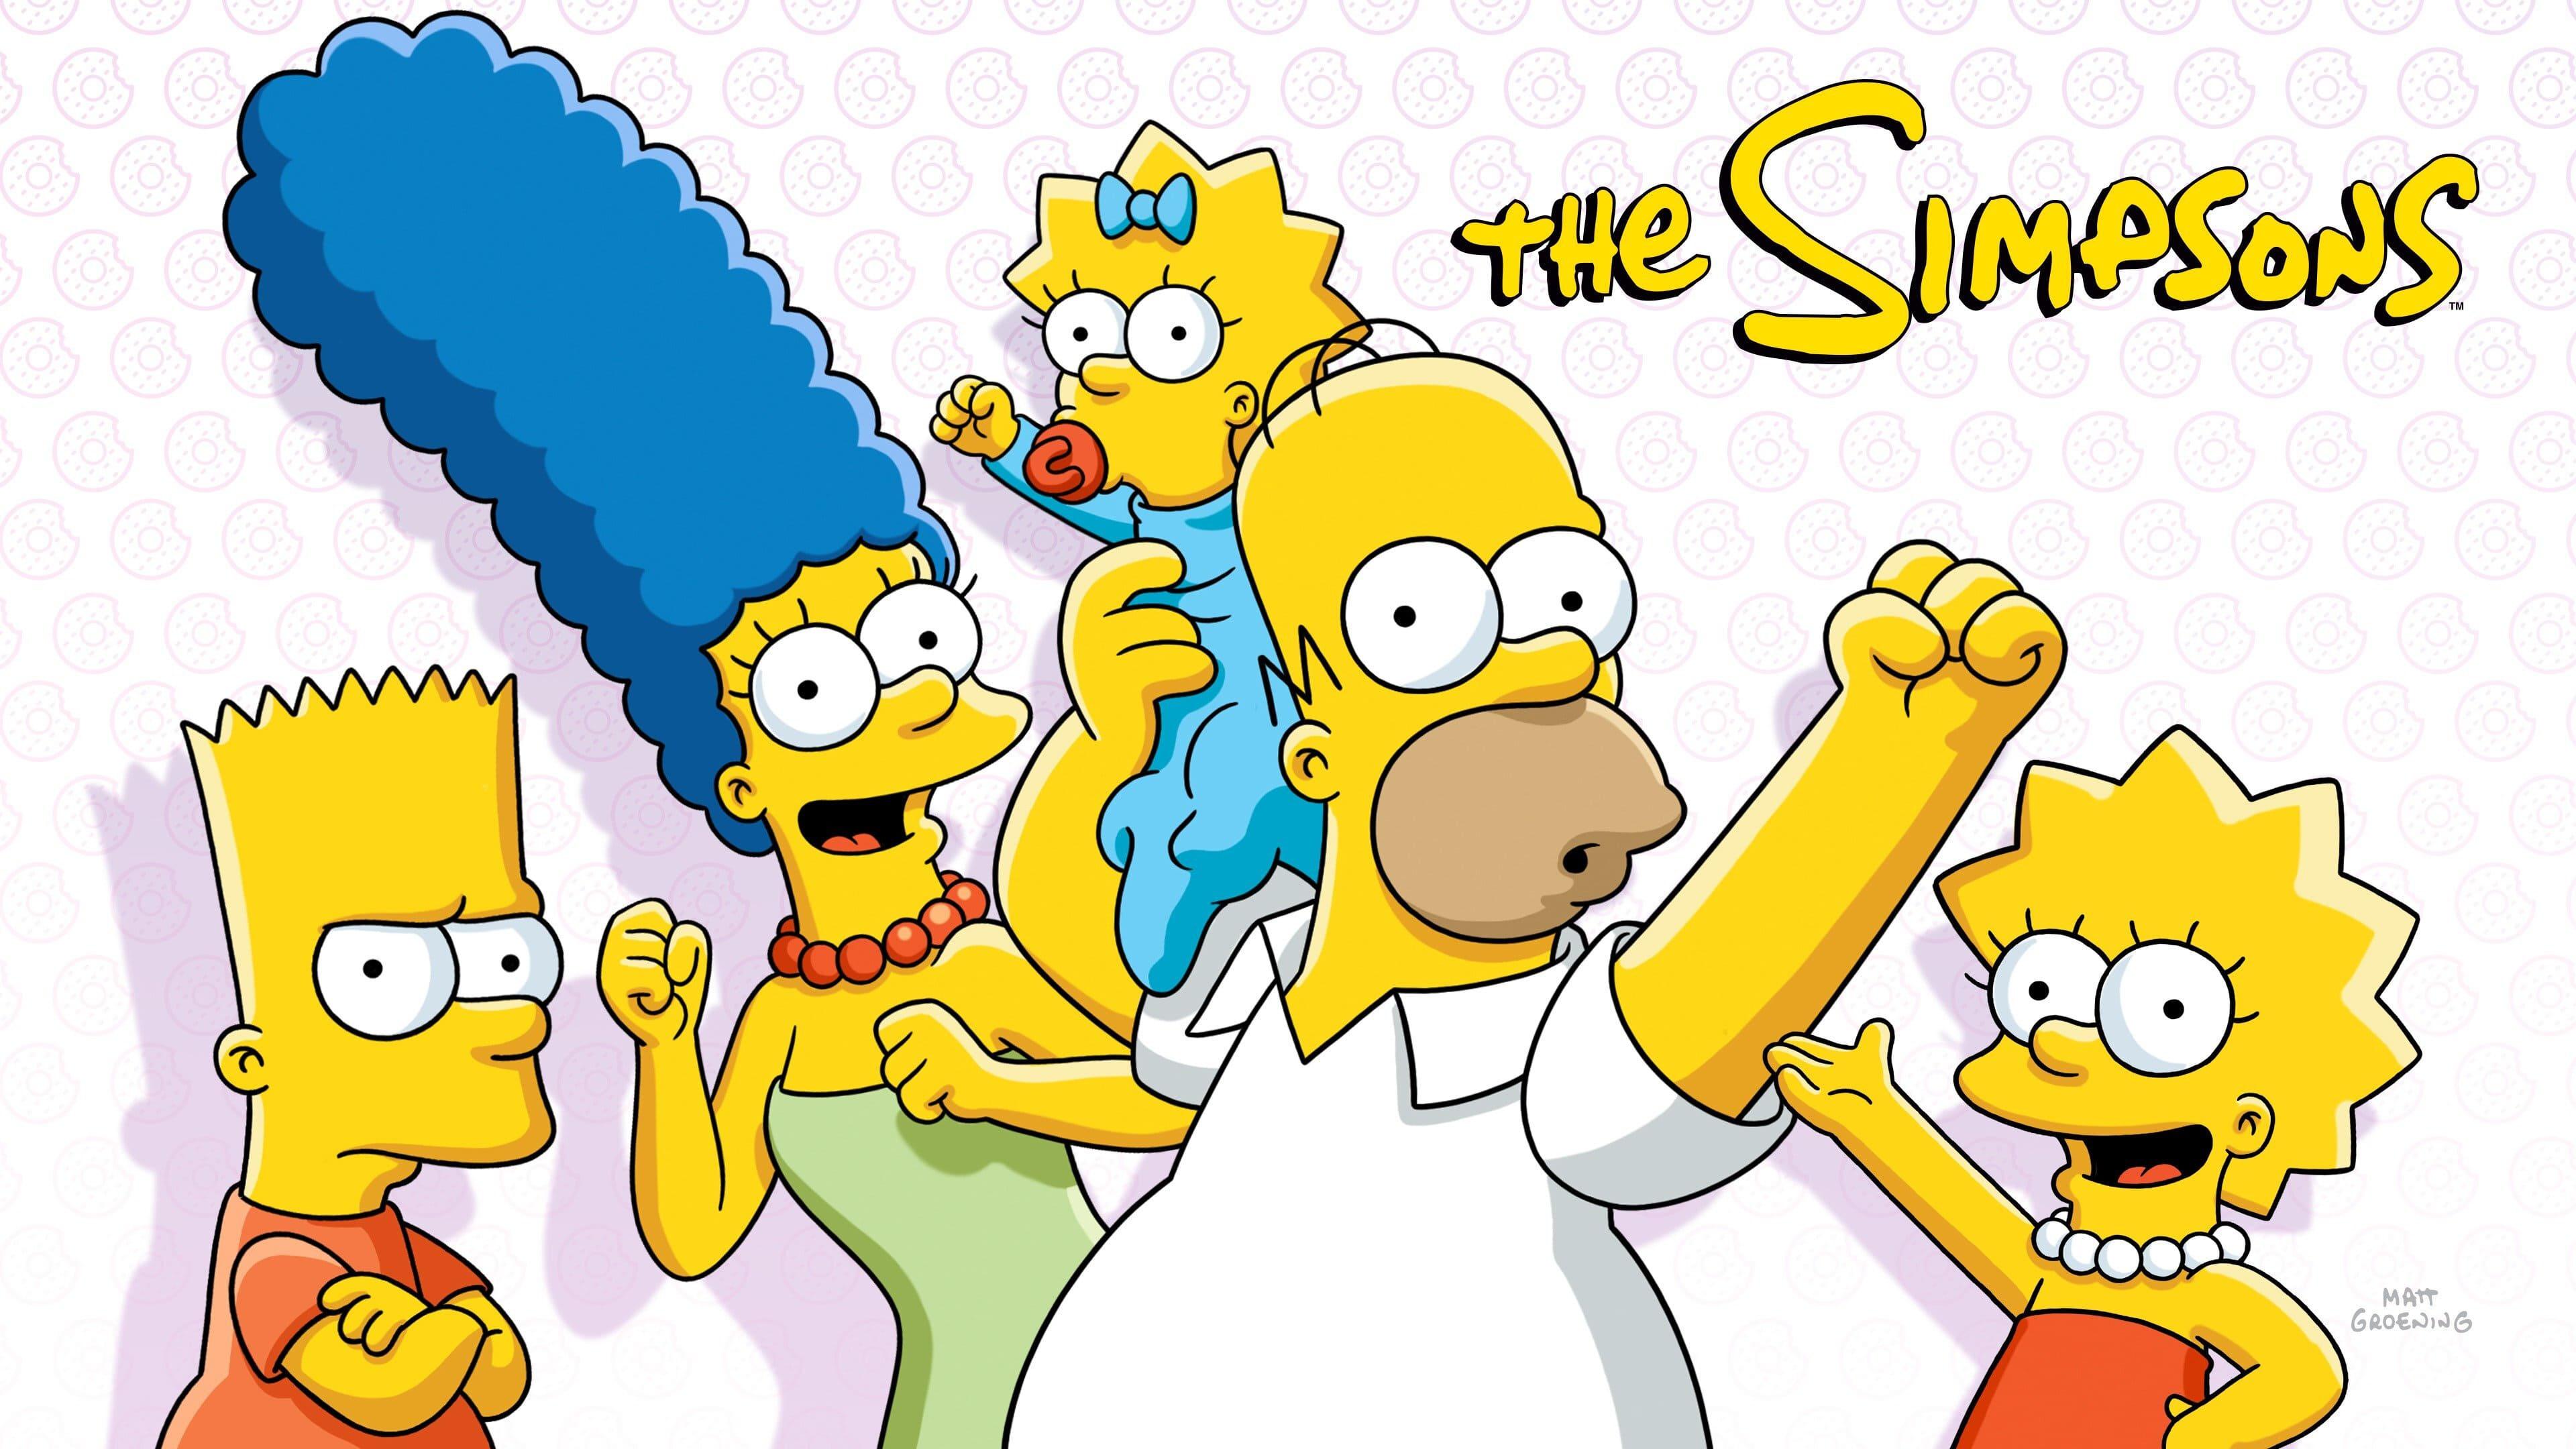 The Simpsons - Season 32